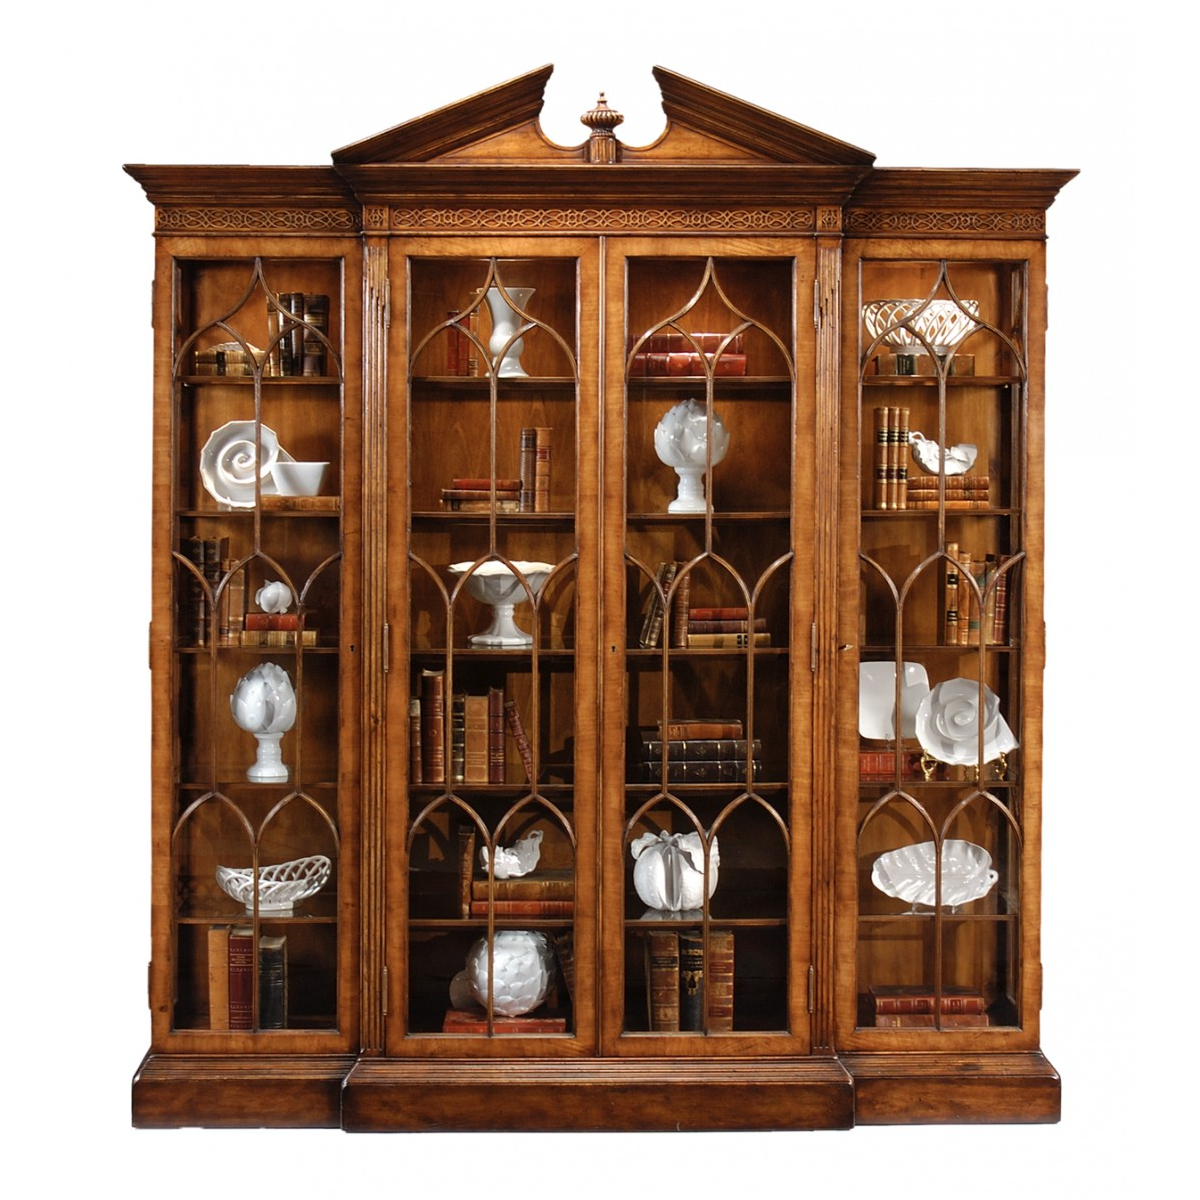 493073 Walnut breakfront triple display cabinet - на 360.ru: цены, описание, характеристики, где купить в Москве.